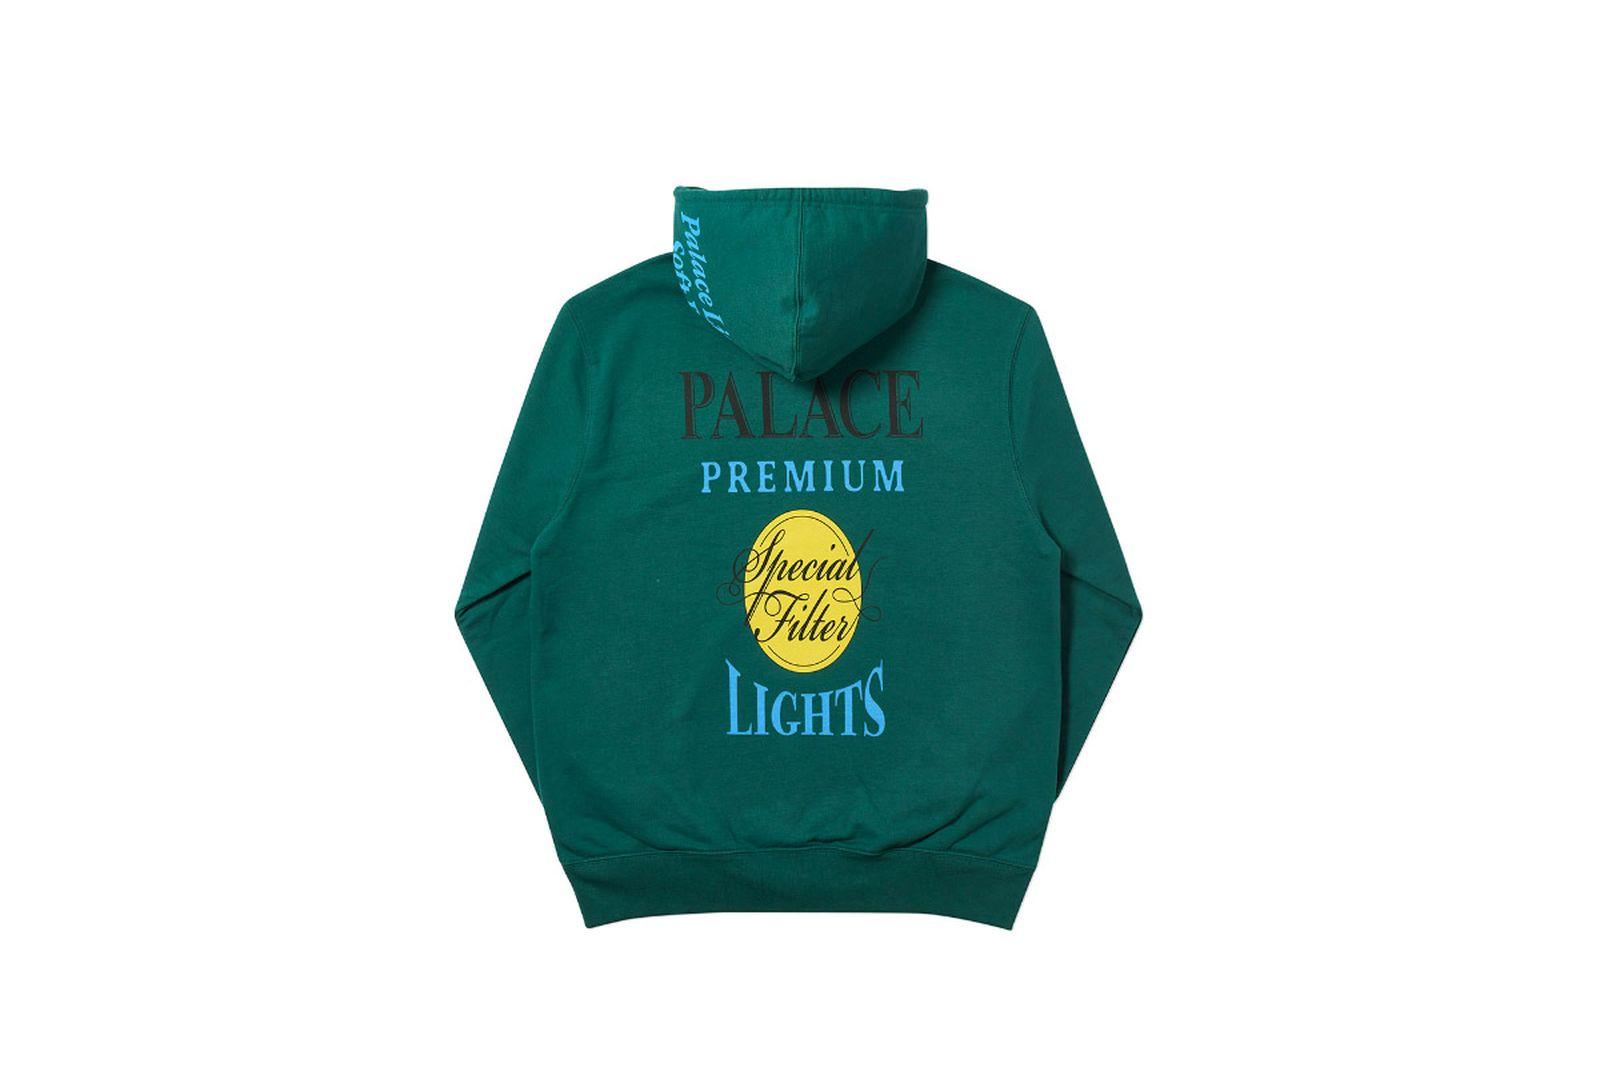 Palace 2019 Autumn Hood Blender green back